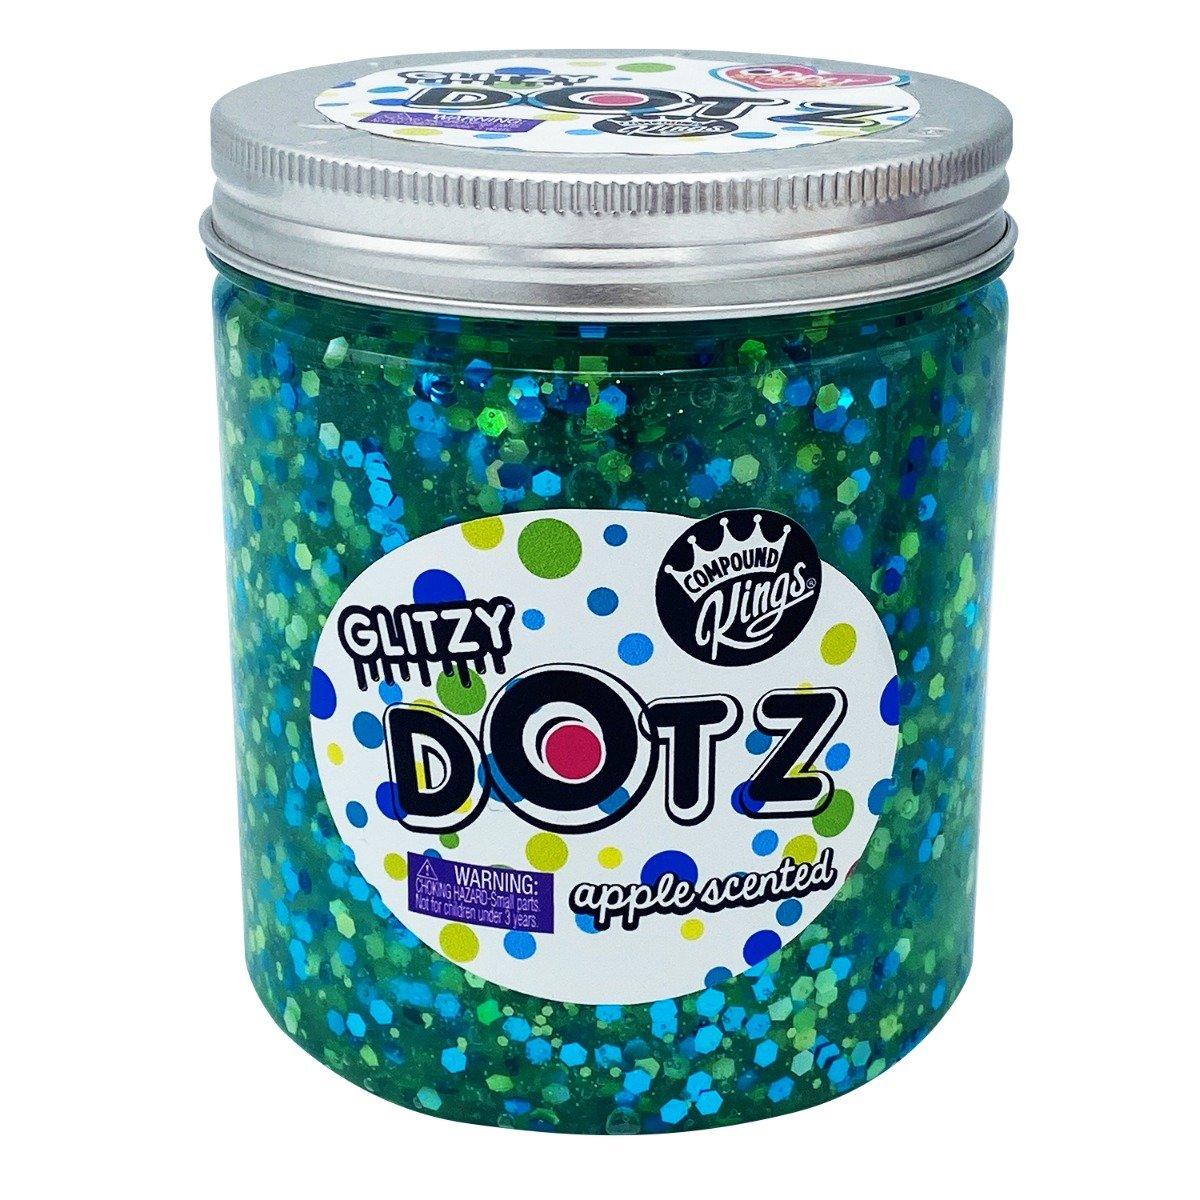 Gelatina Compound Kings - Glitzy Dotz Slime, Apple, 425 g